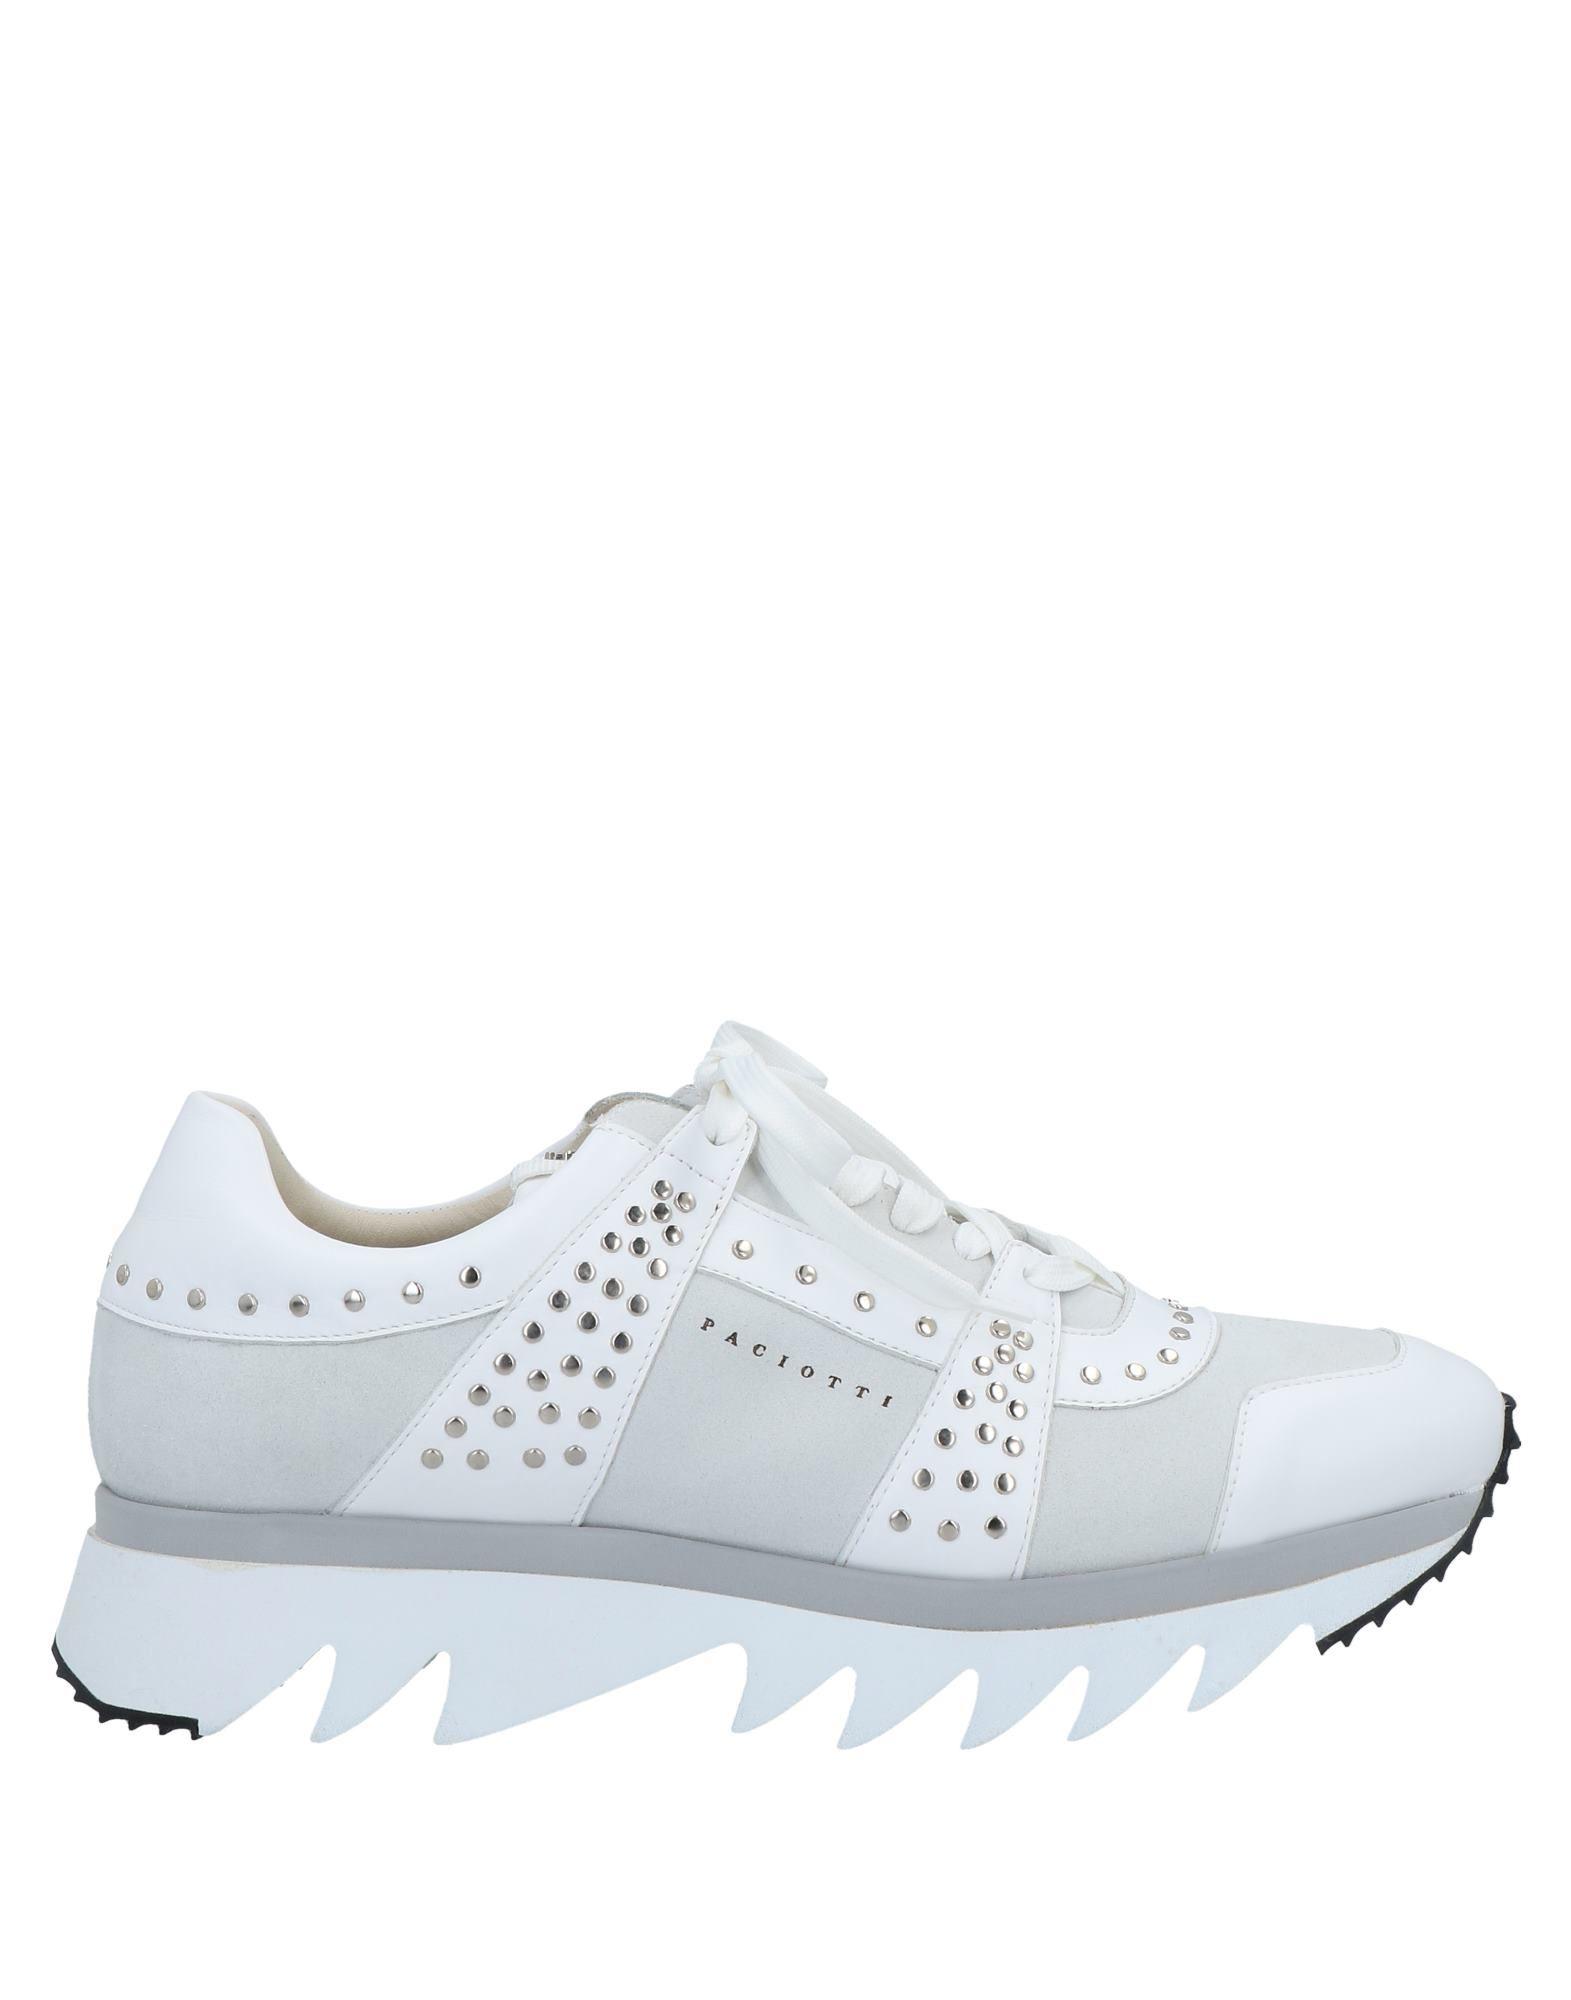 CESARE PACIOTTI Low-tops & sneakers - Item 17008120